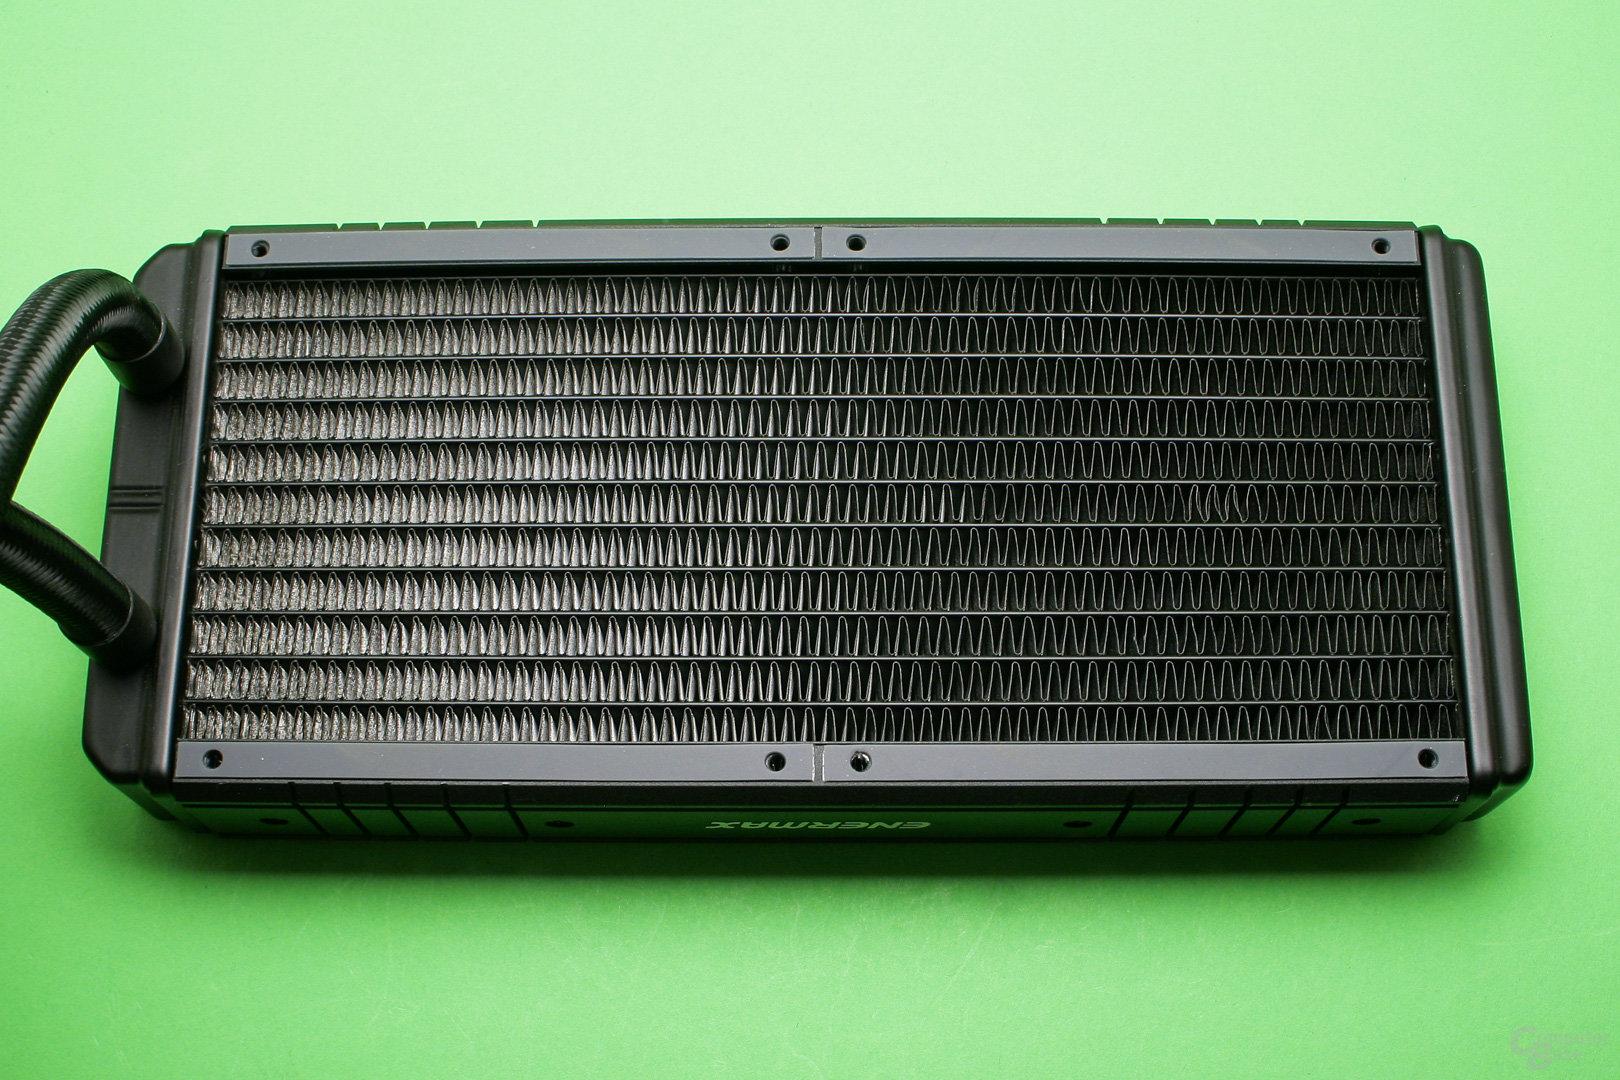 Enermax Liqtech 240 TR4: Der Radiator ist gut verarbeitet